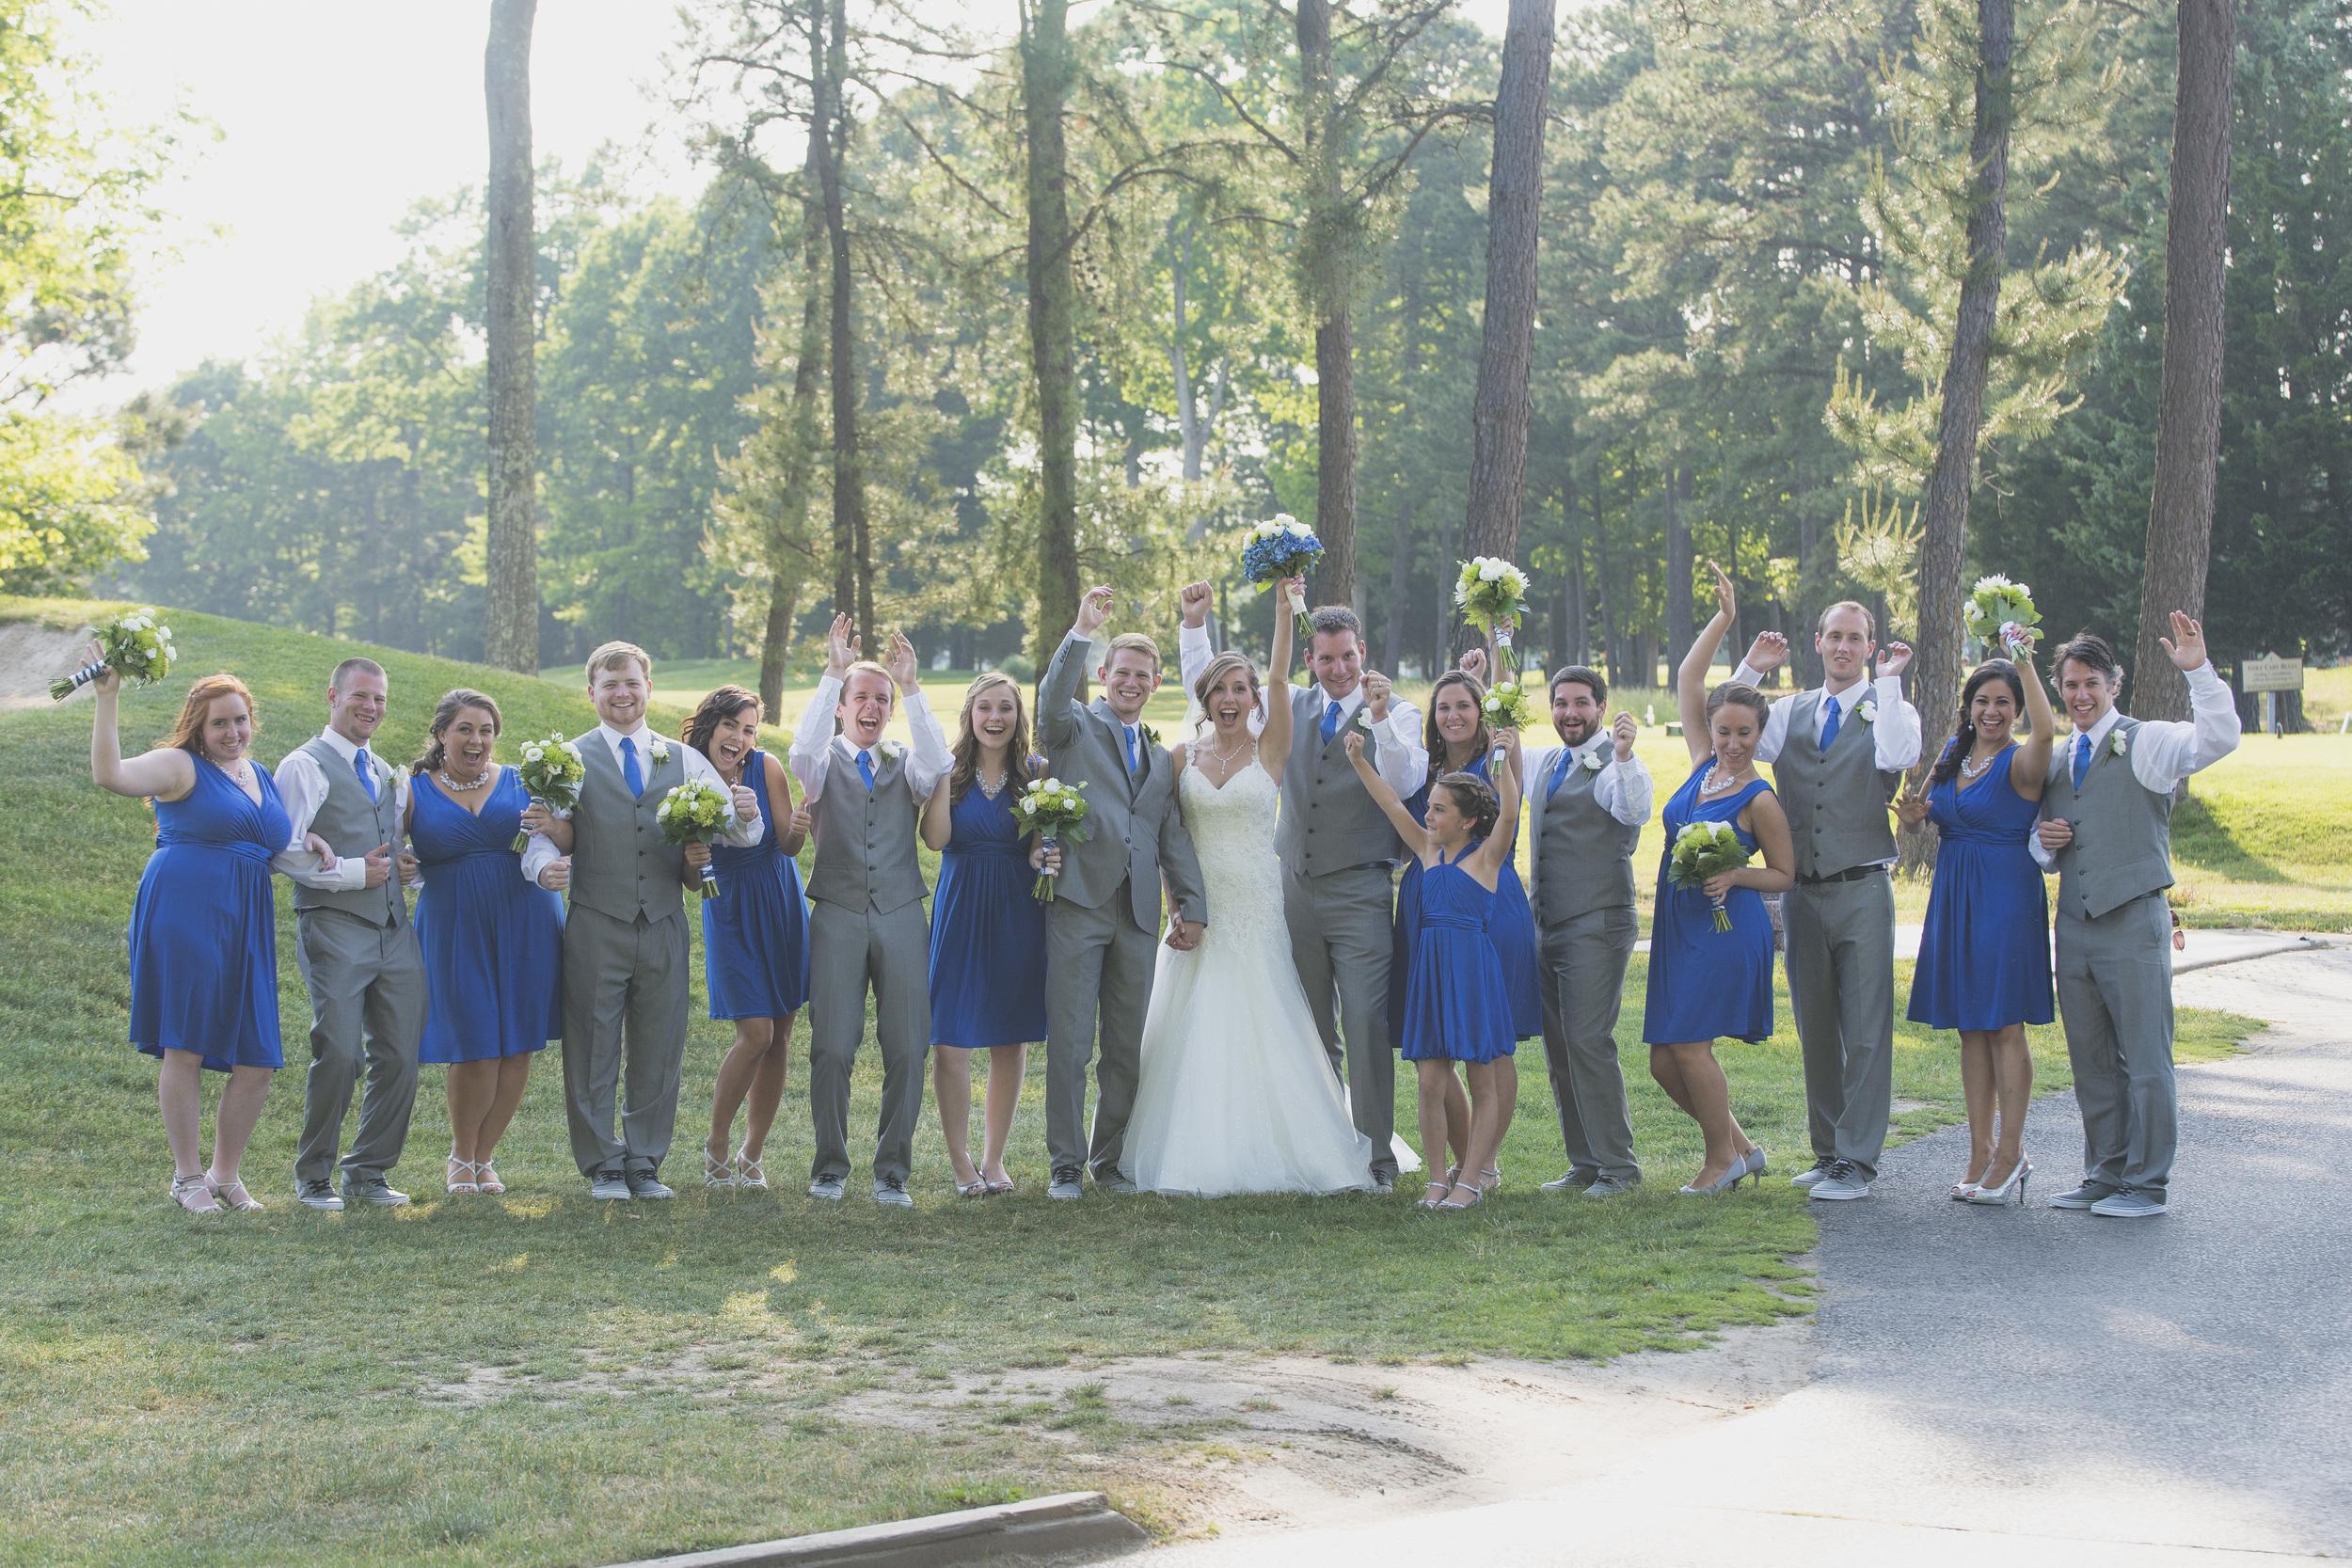 New_jersey_blue_heron_pines_wedding20150529_0564.jpg